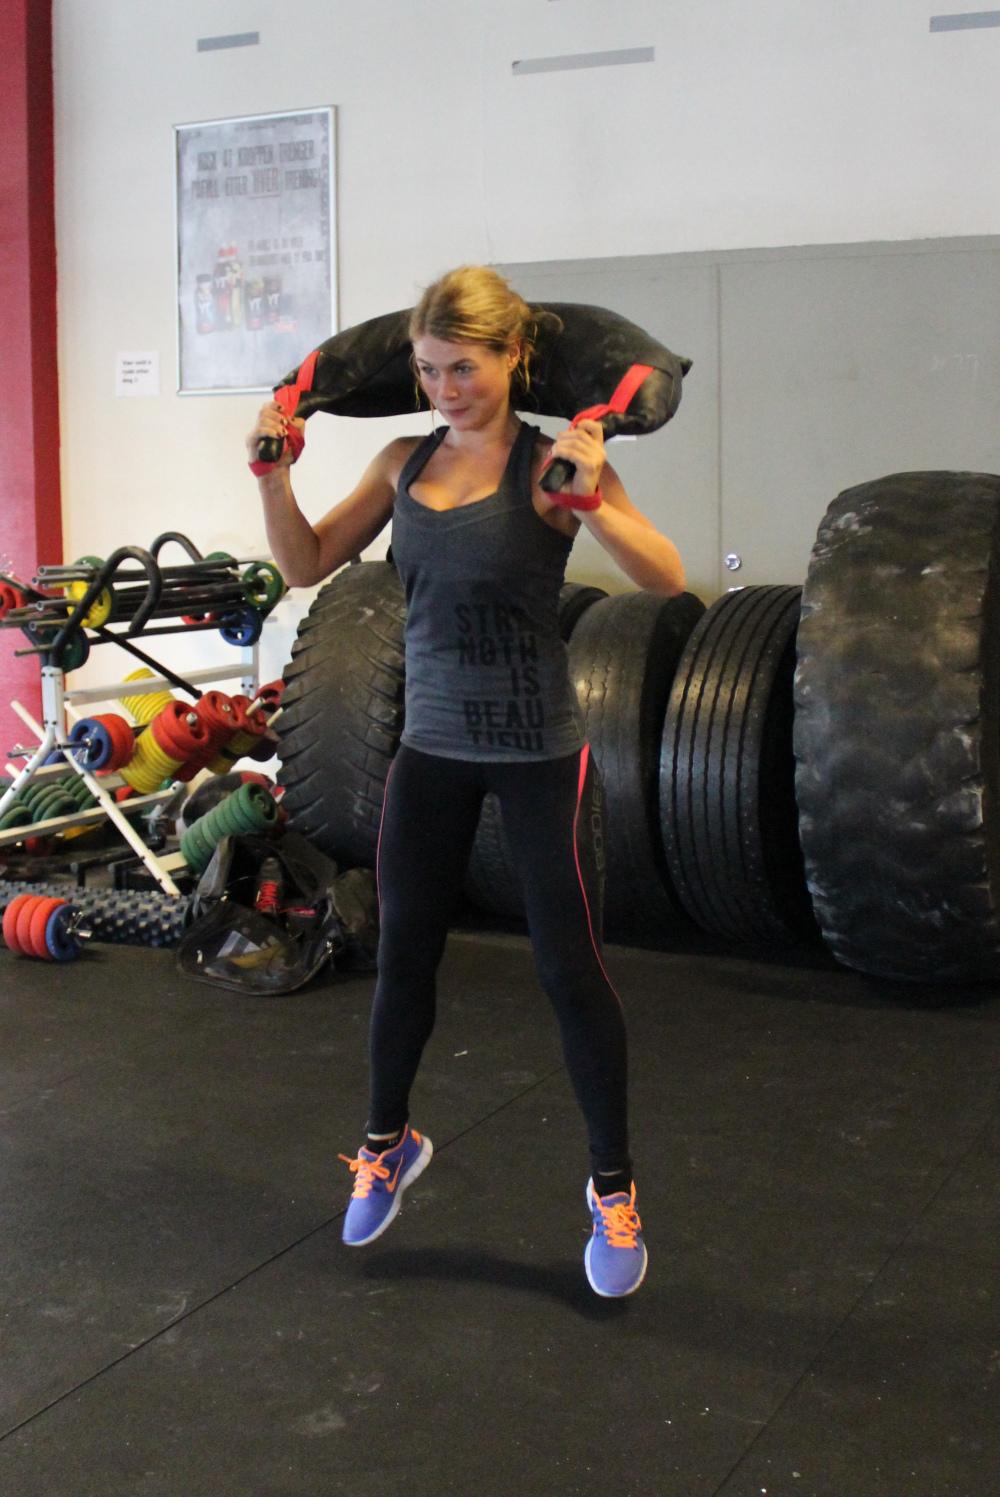 Fitnessnora – Maxpuls, crossfit og kveldsmat